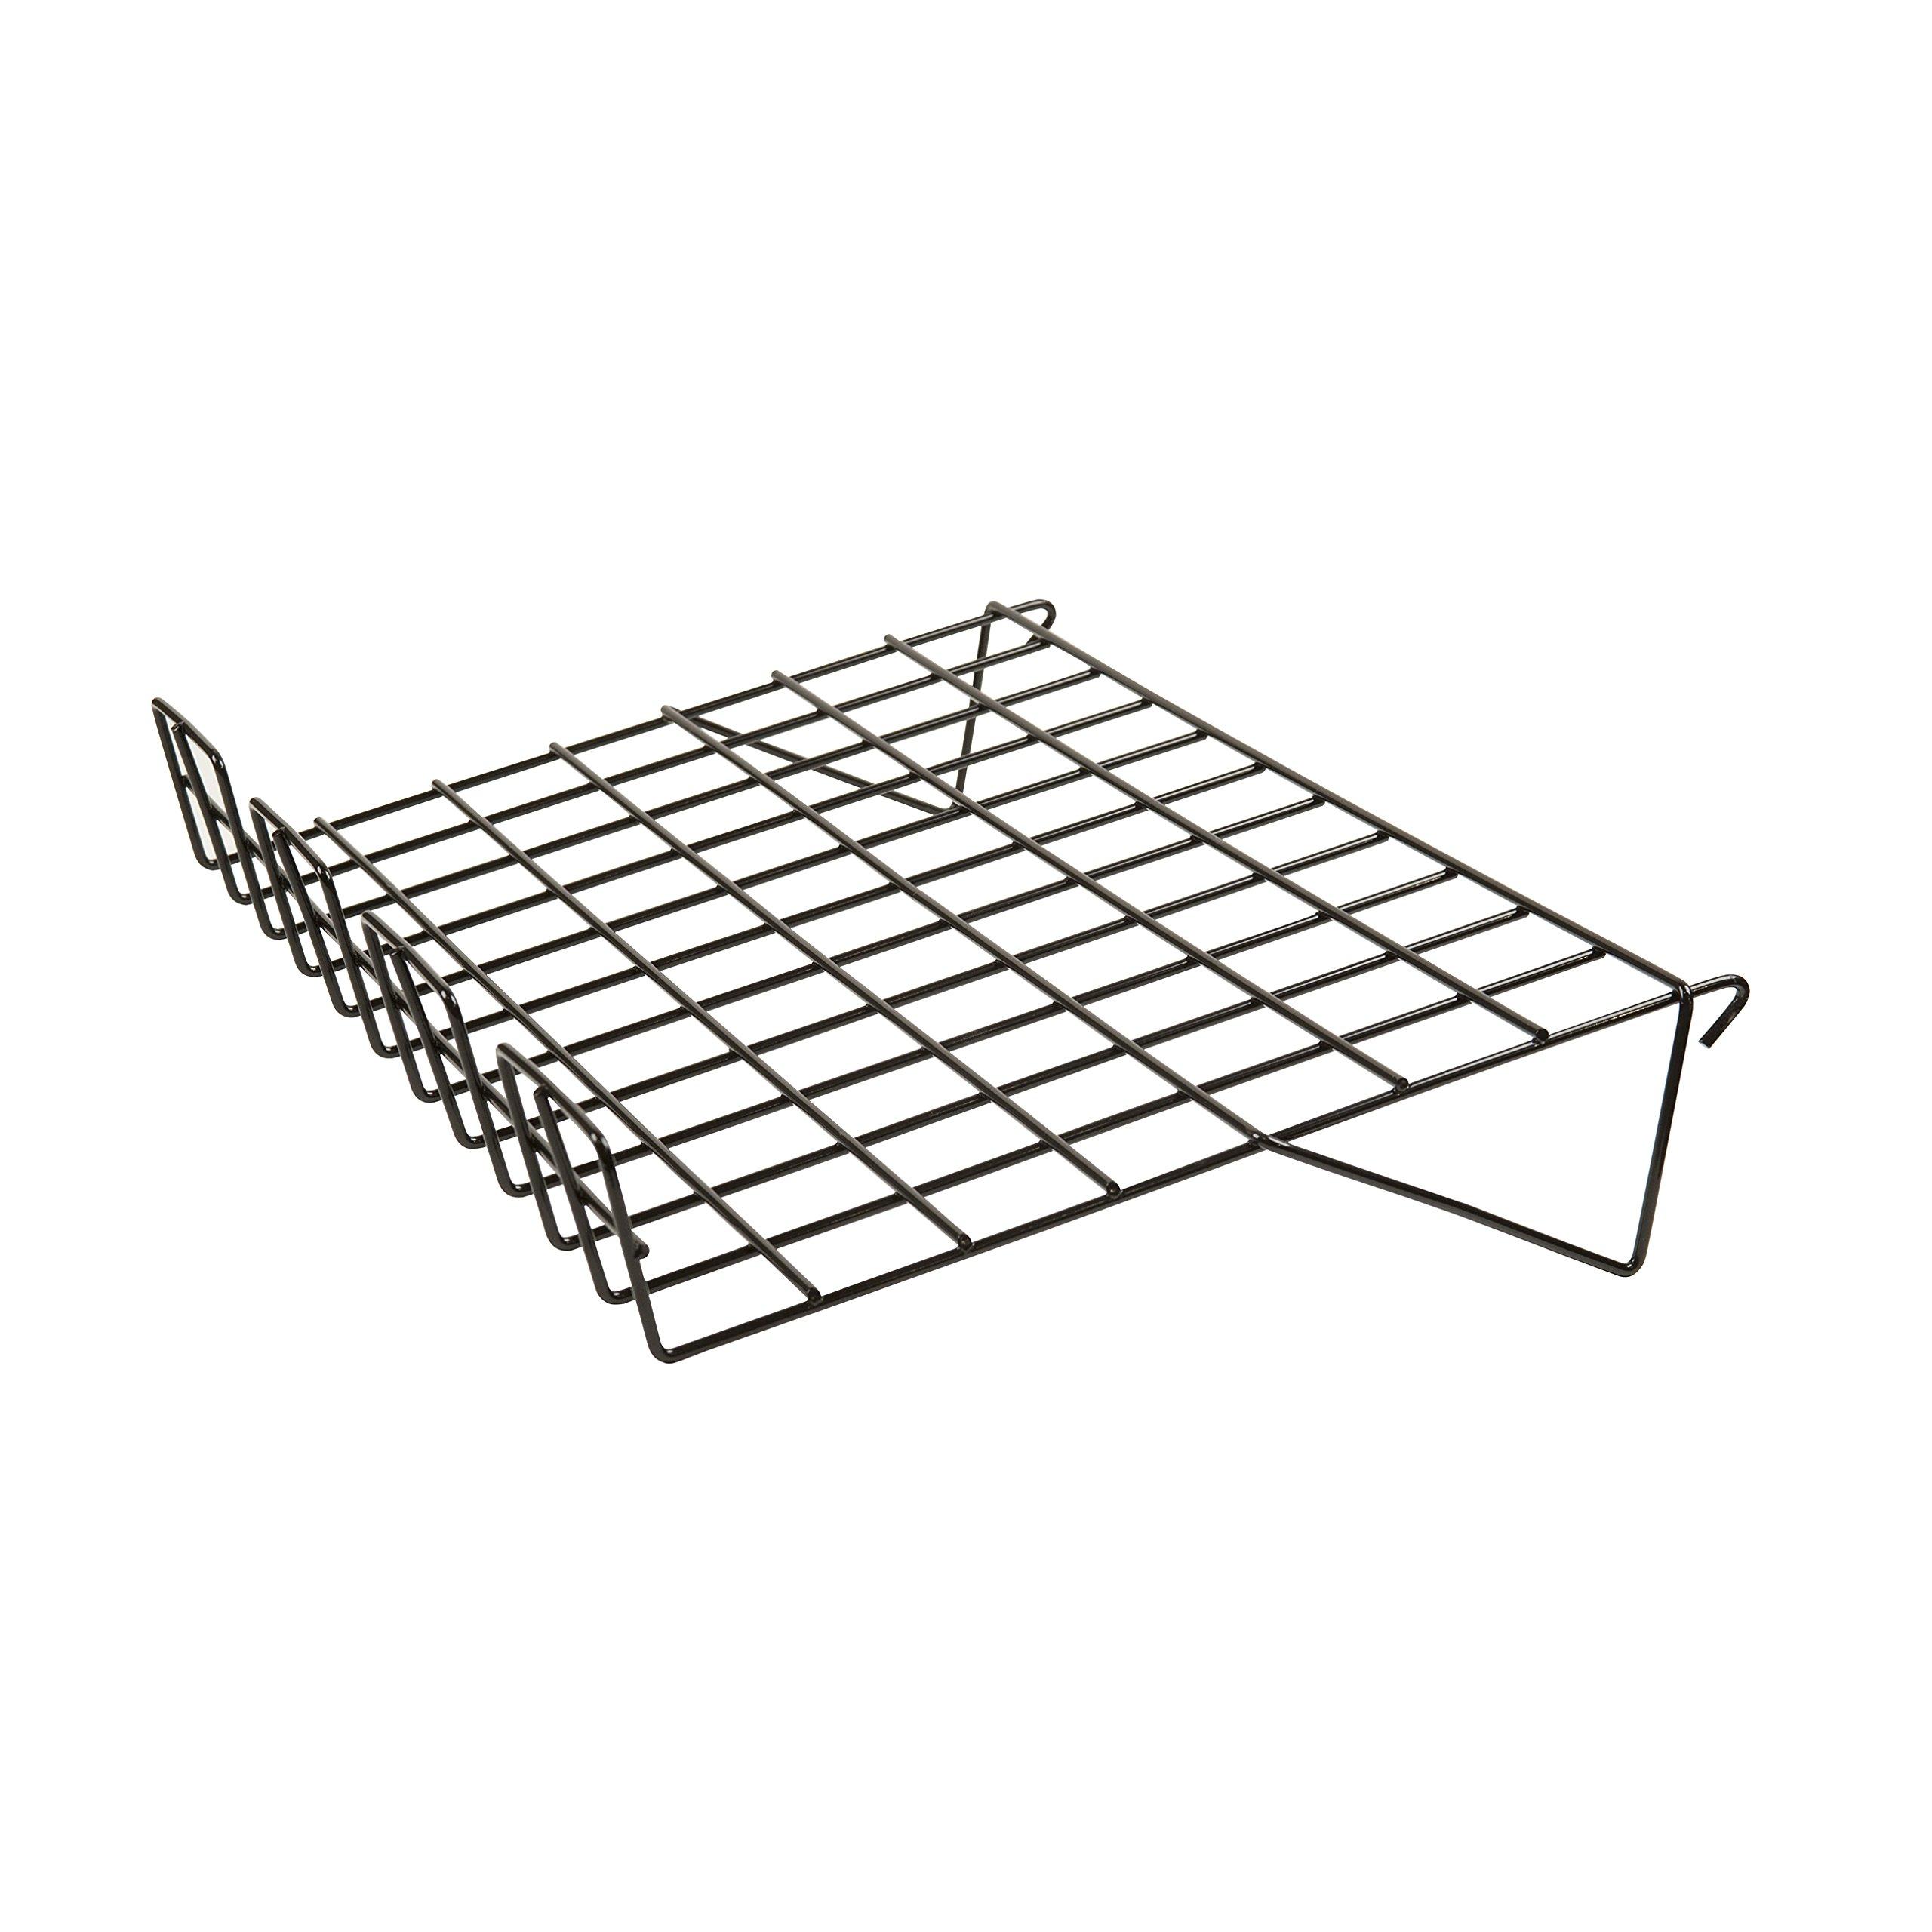 Econoco BLK/SL22 Sloping Shelf with 3'' Lip, 14'' Depth x 22-1/2'' Length, Black (Pack of 6)